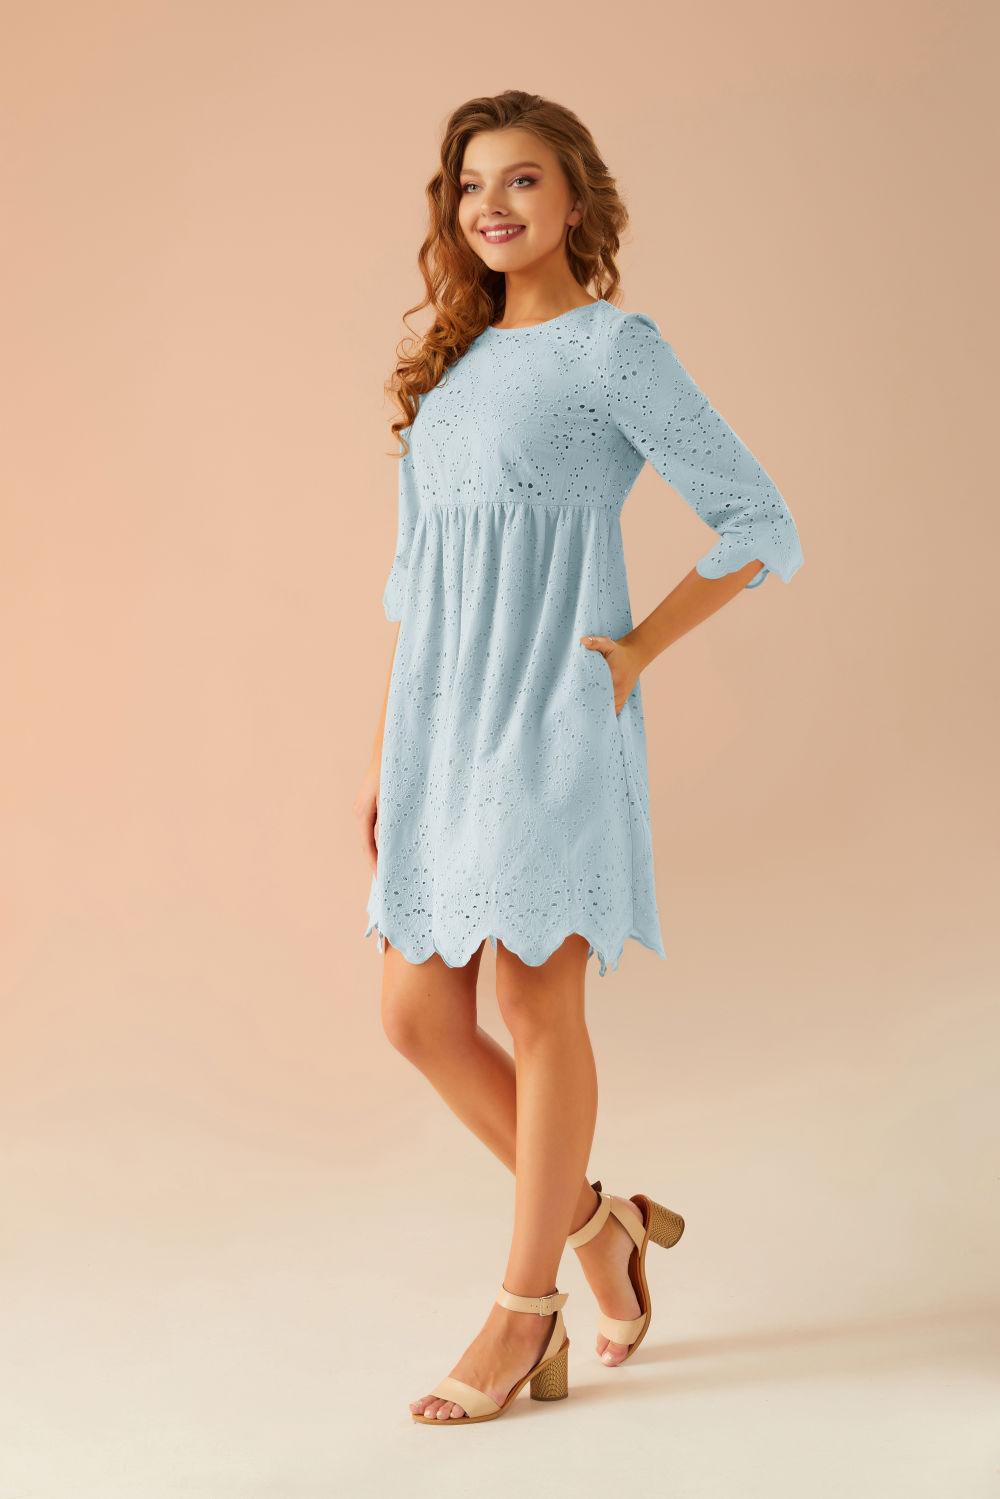 Andrea Fashion Af 3 Платье